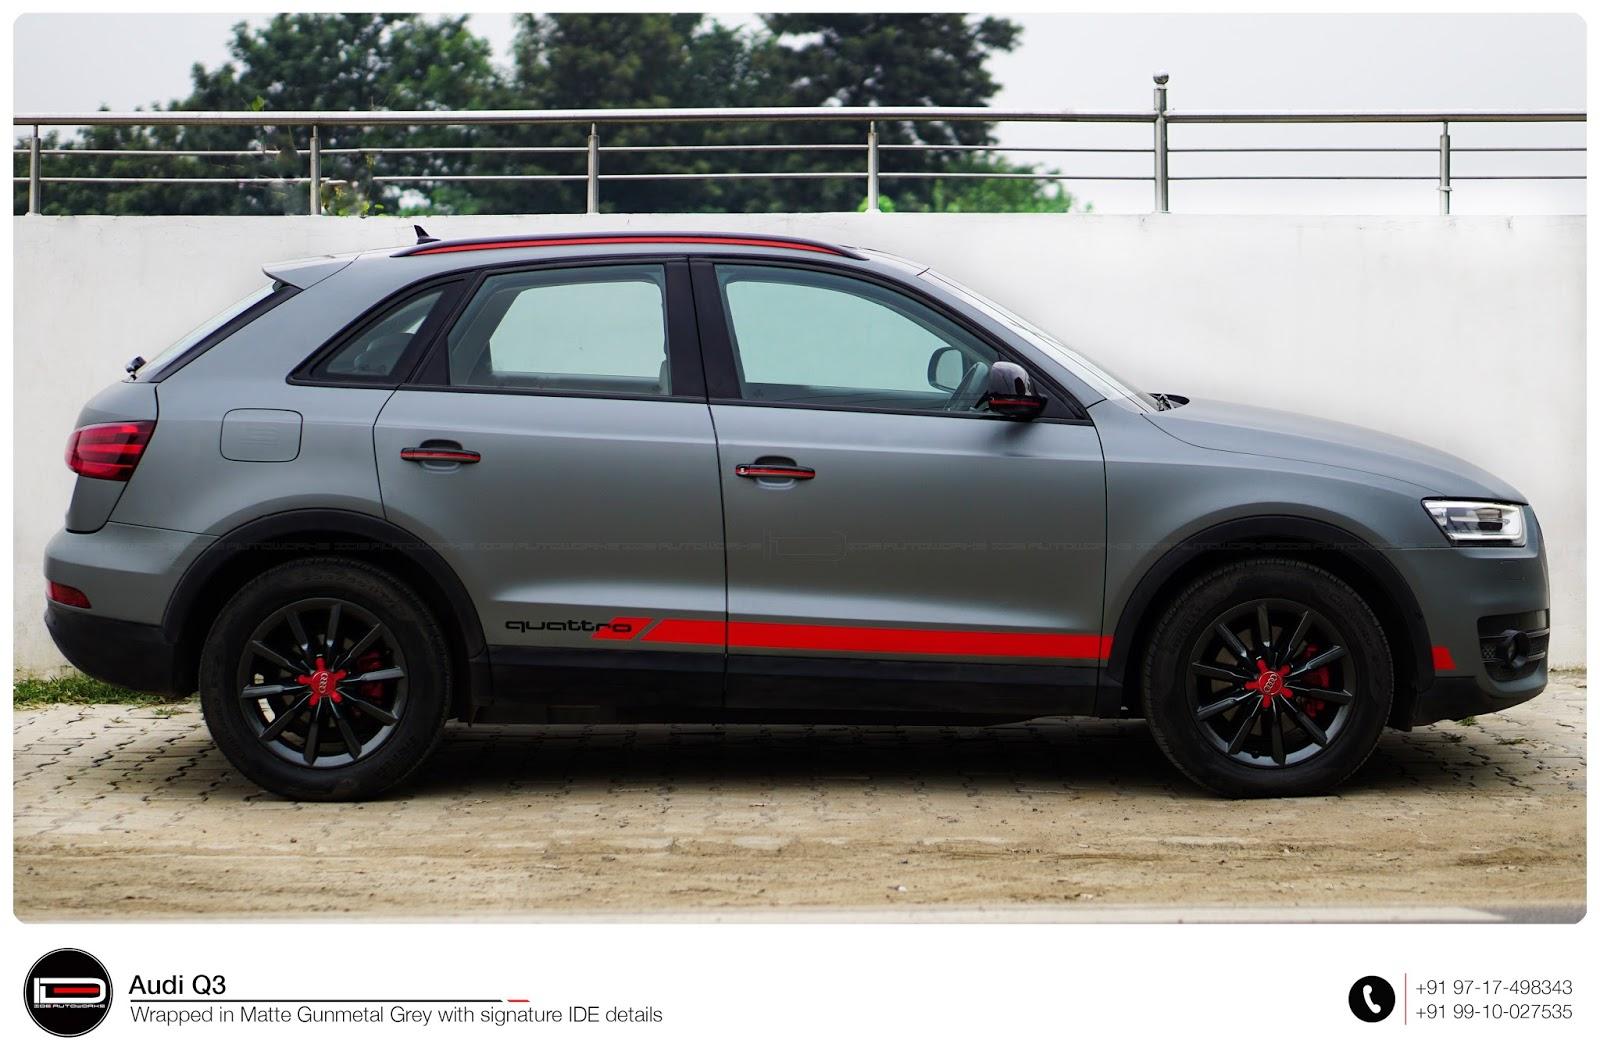 Audi Q3: Full Car Wrap | IDE Autoworks